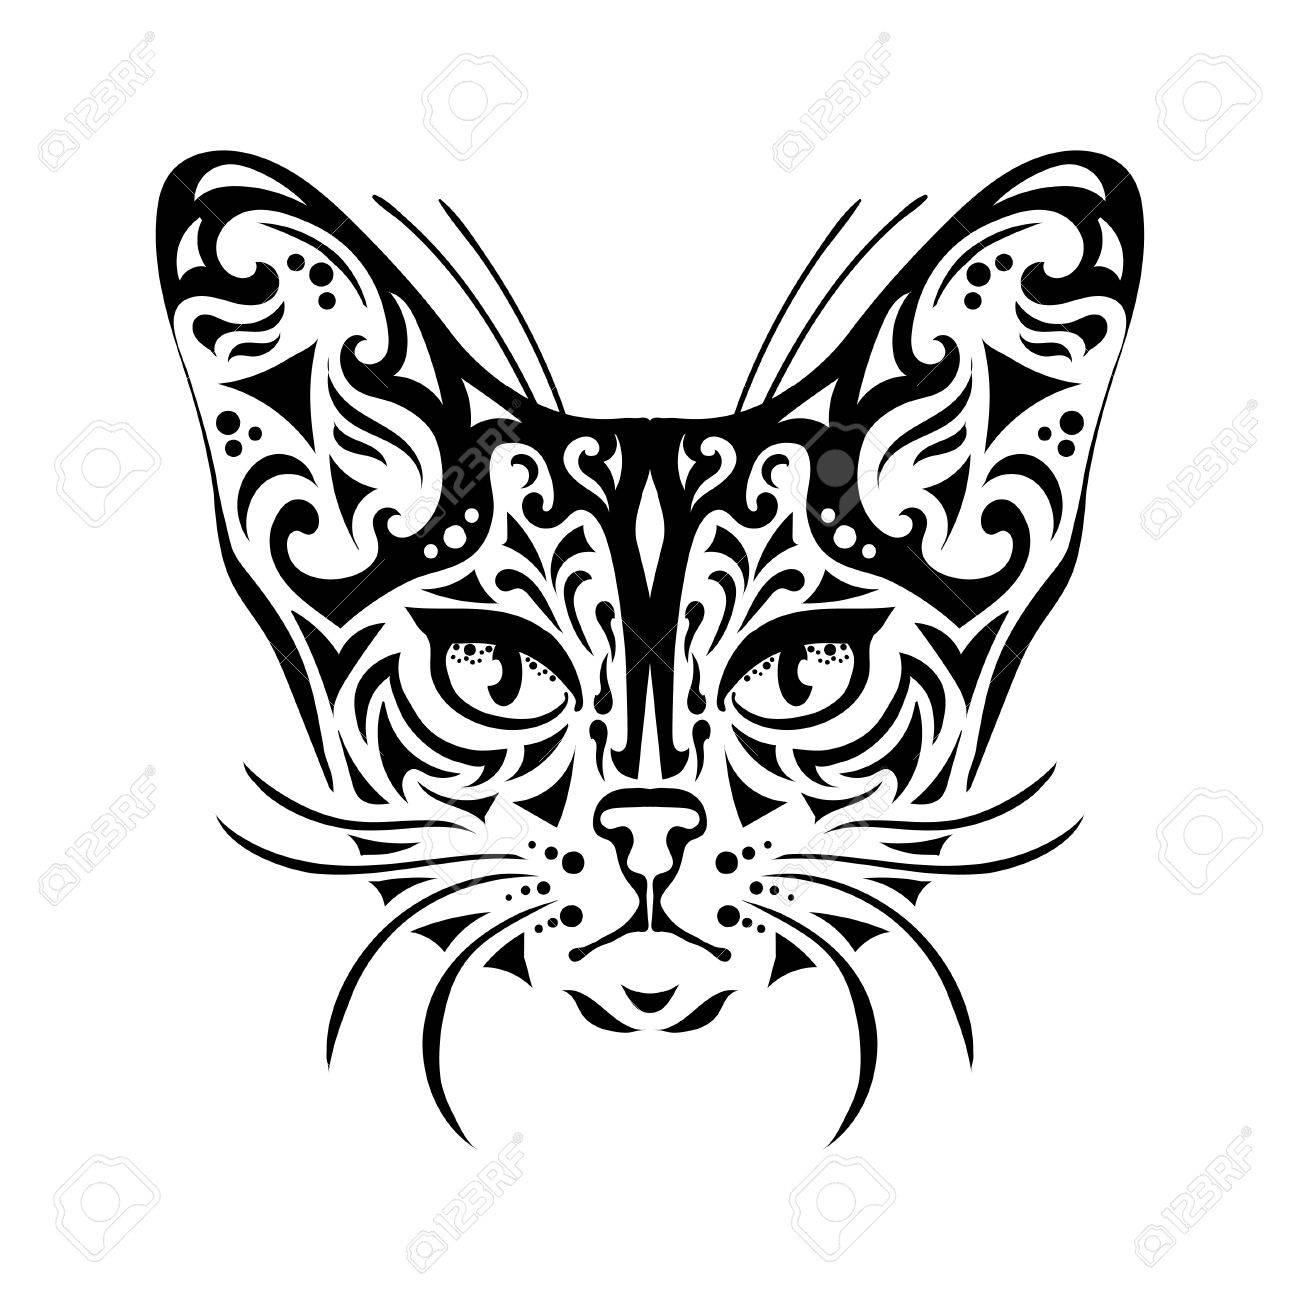 1300x1300 Ornamental Decorative Isolated Black Cat's Muzzle On A White